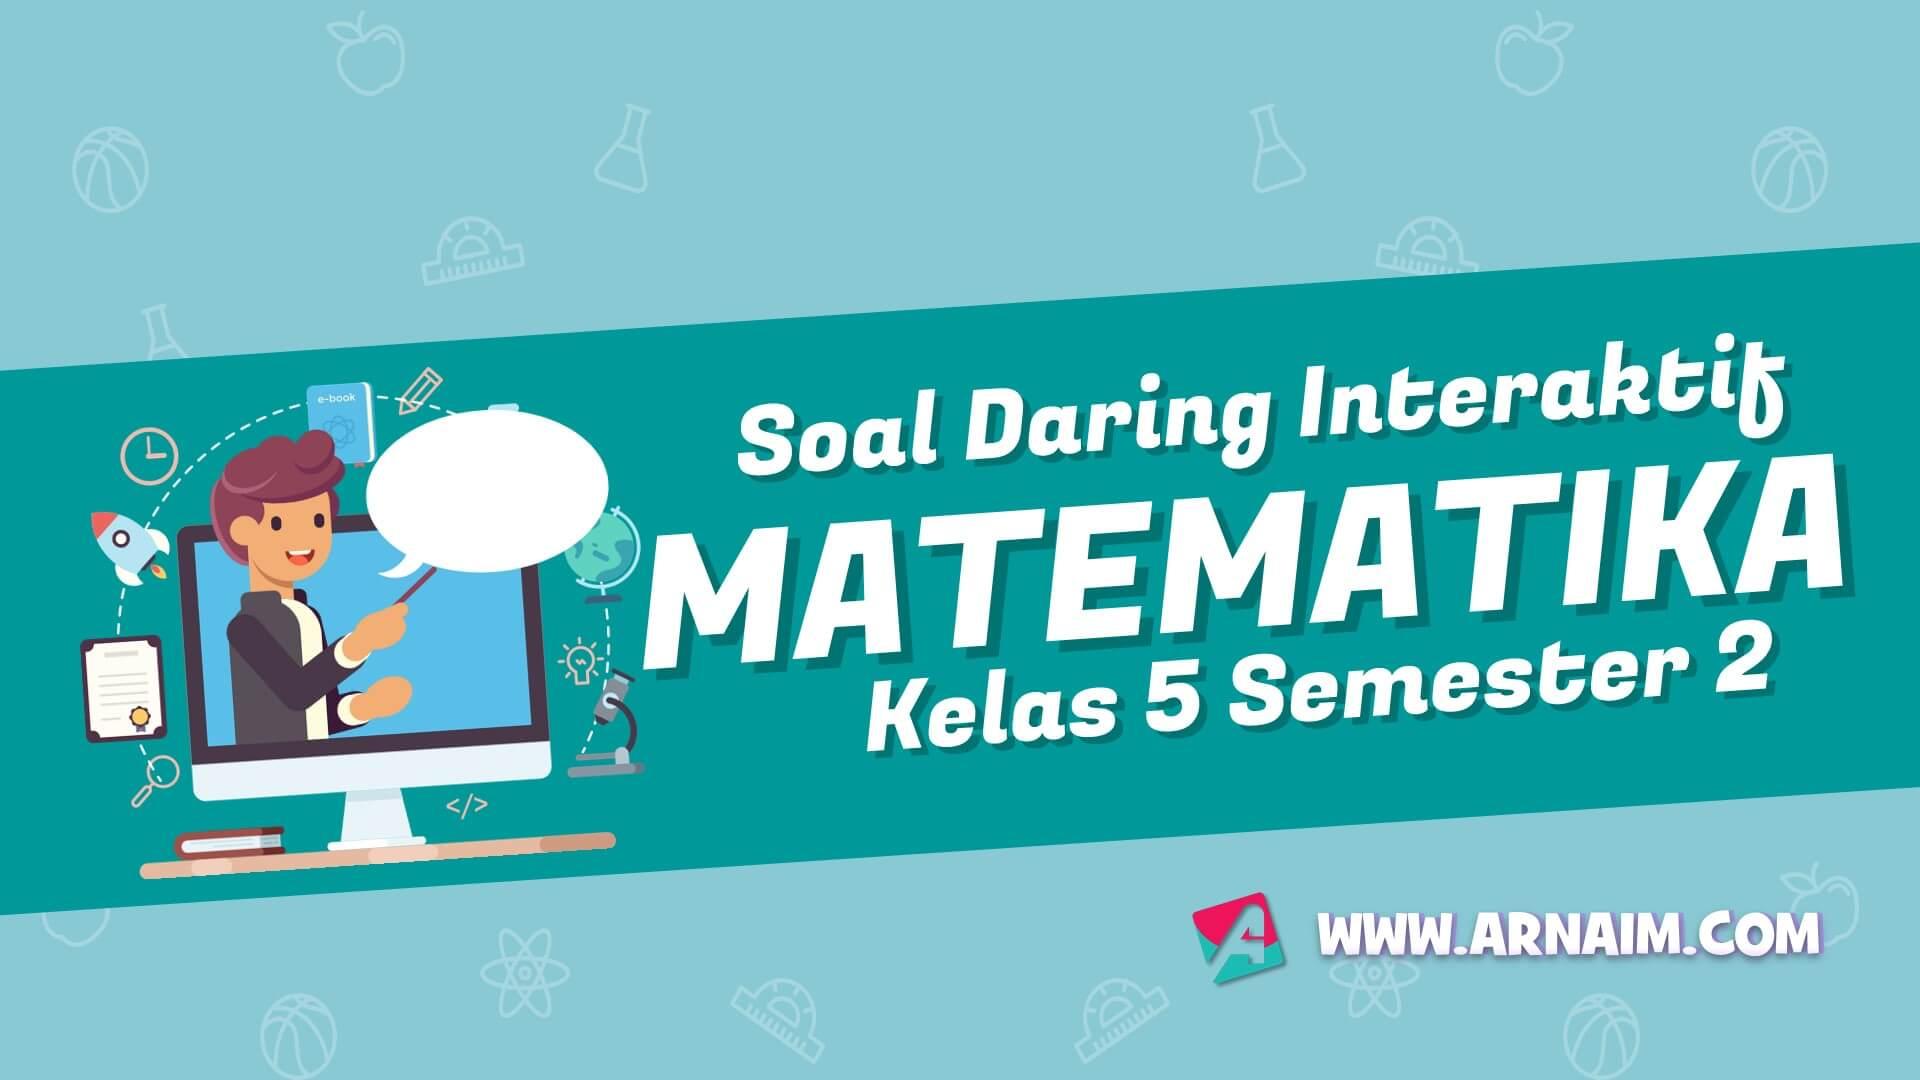 ARNAIM.COM - SOAL DARING INTERAKTIF MATEMATIKA KELAS 5 SEMESTER 2